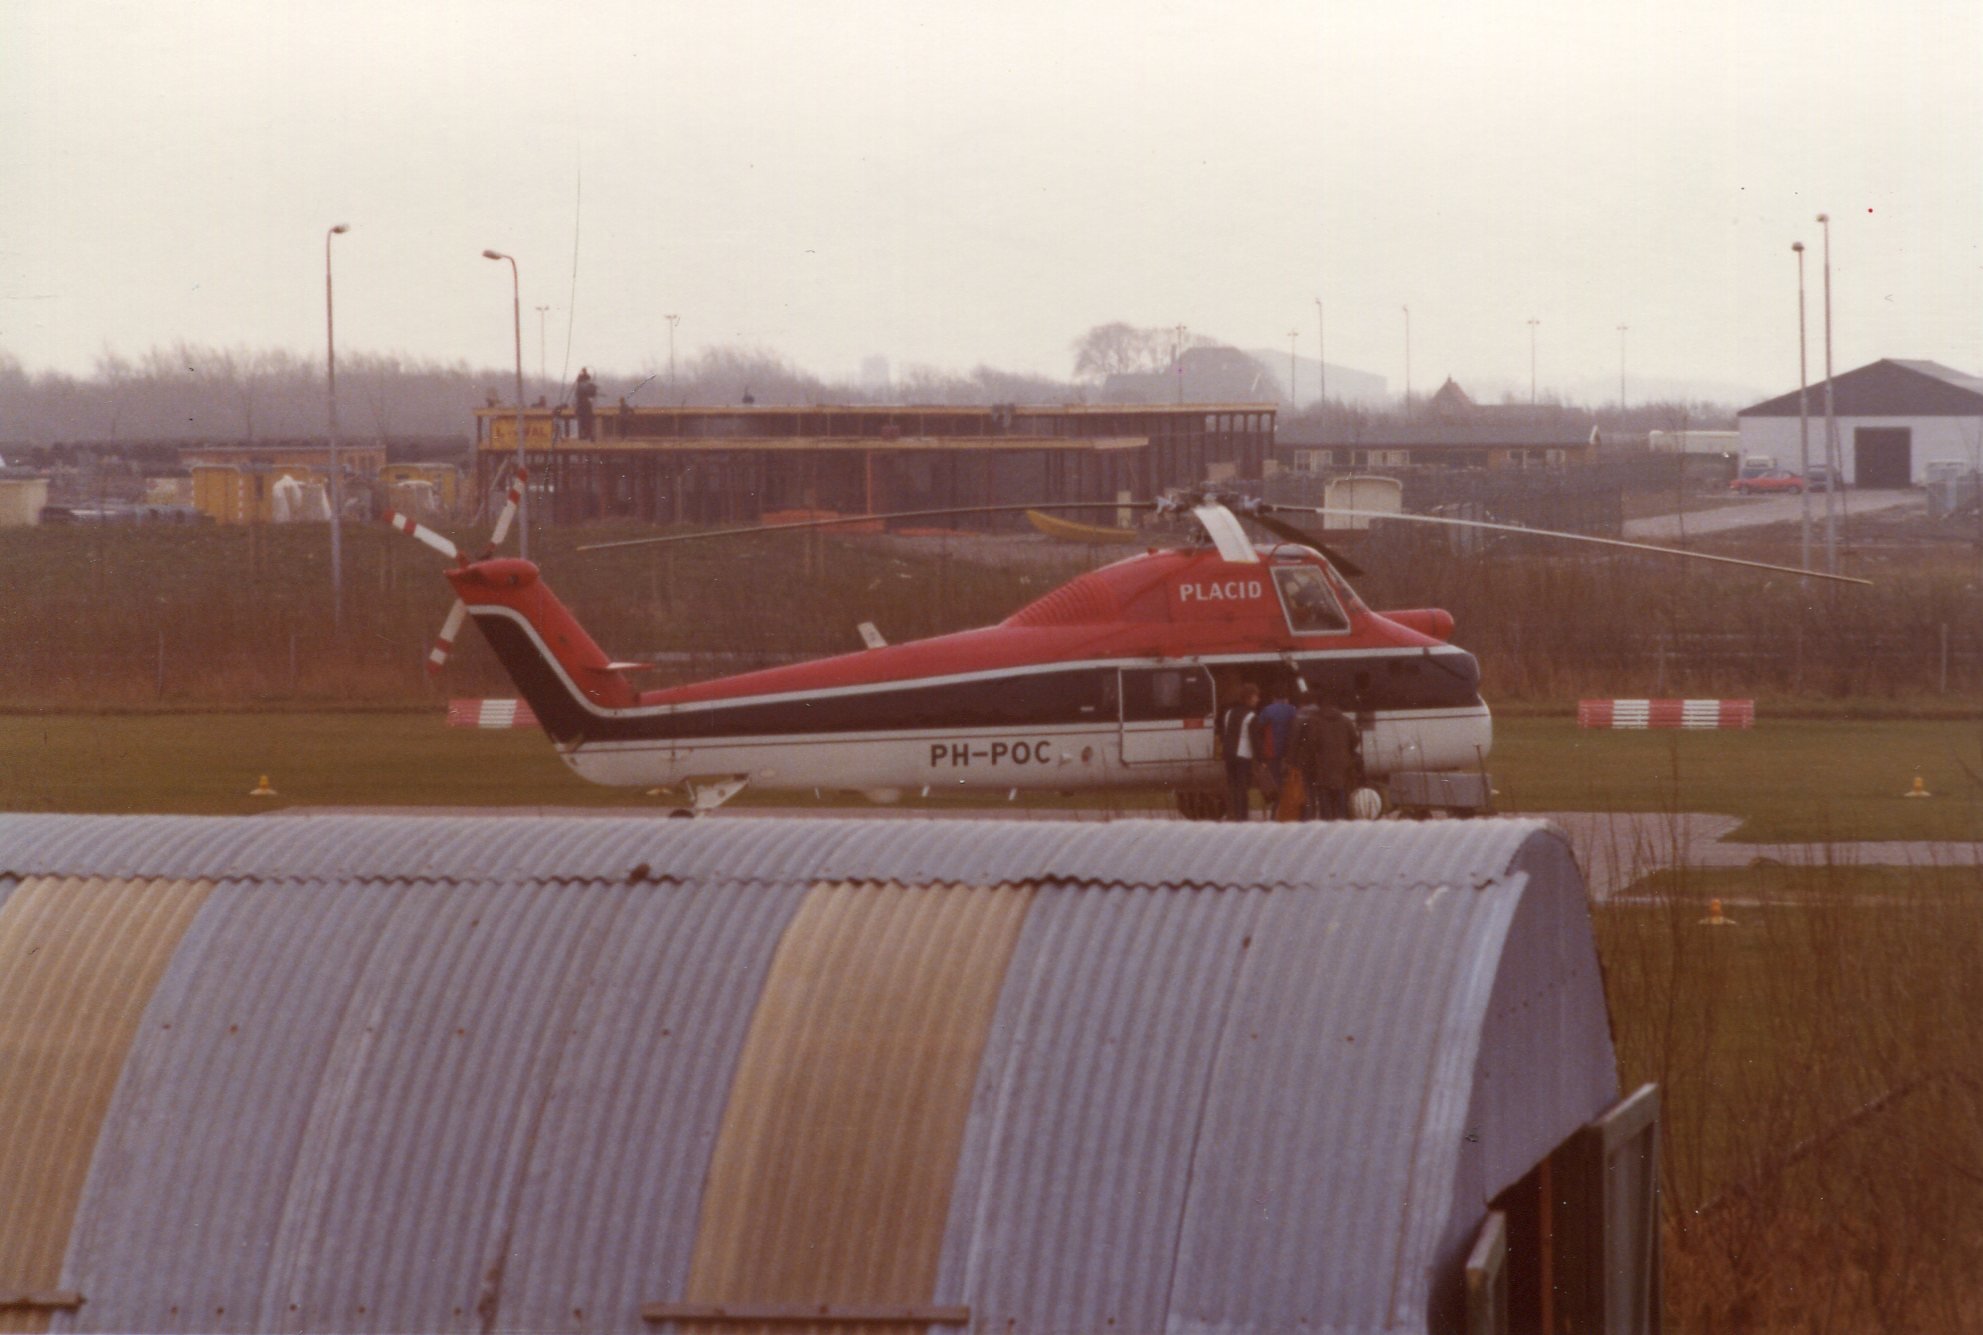 Naam: Den Helder , april 1977 (2).jpg Bekeken: 240 Grootte: 271,9 KB